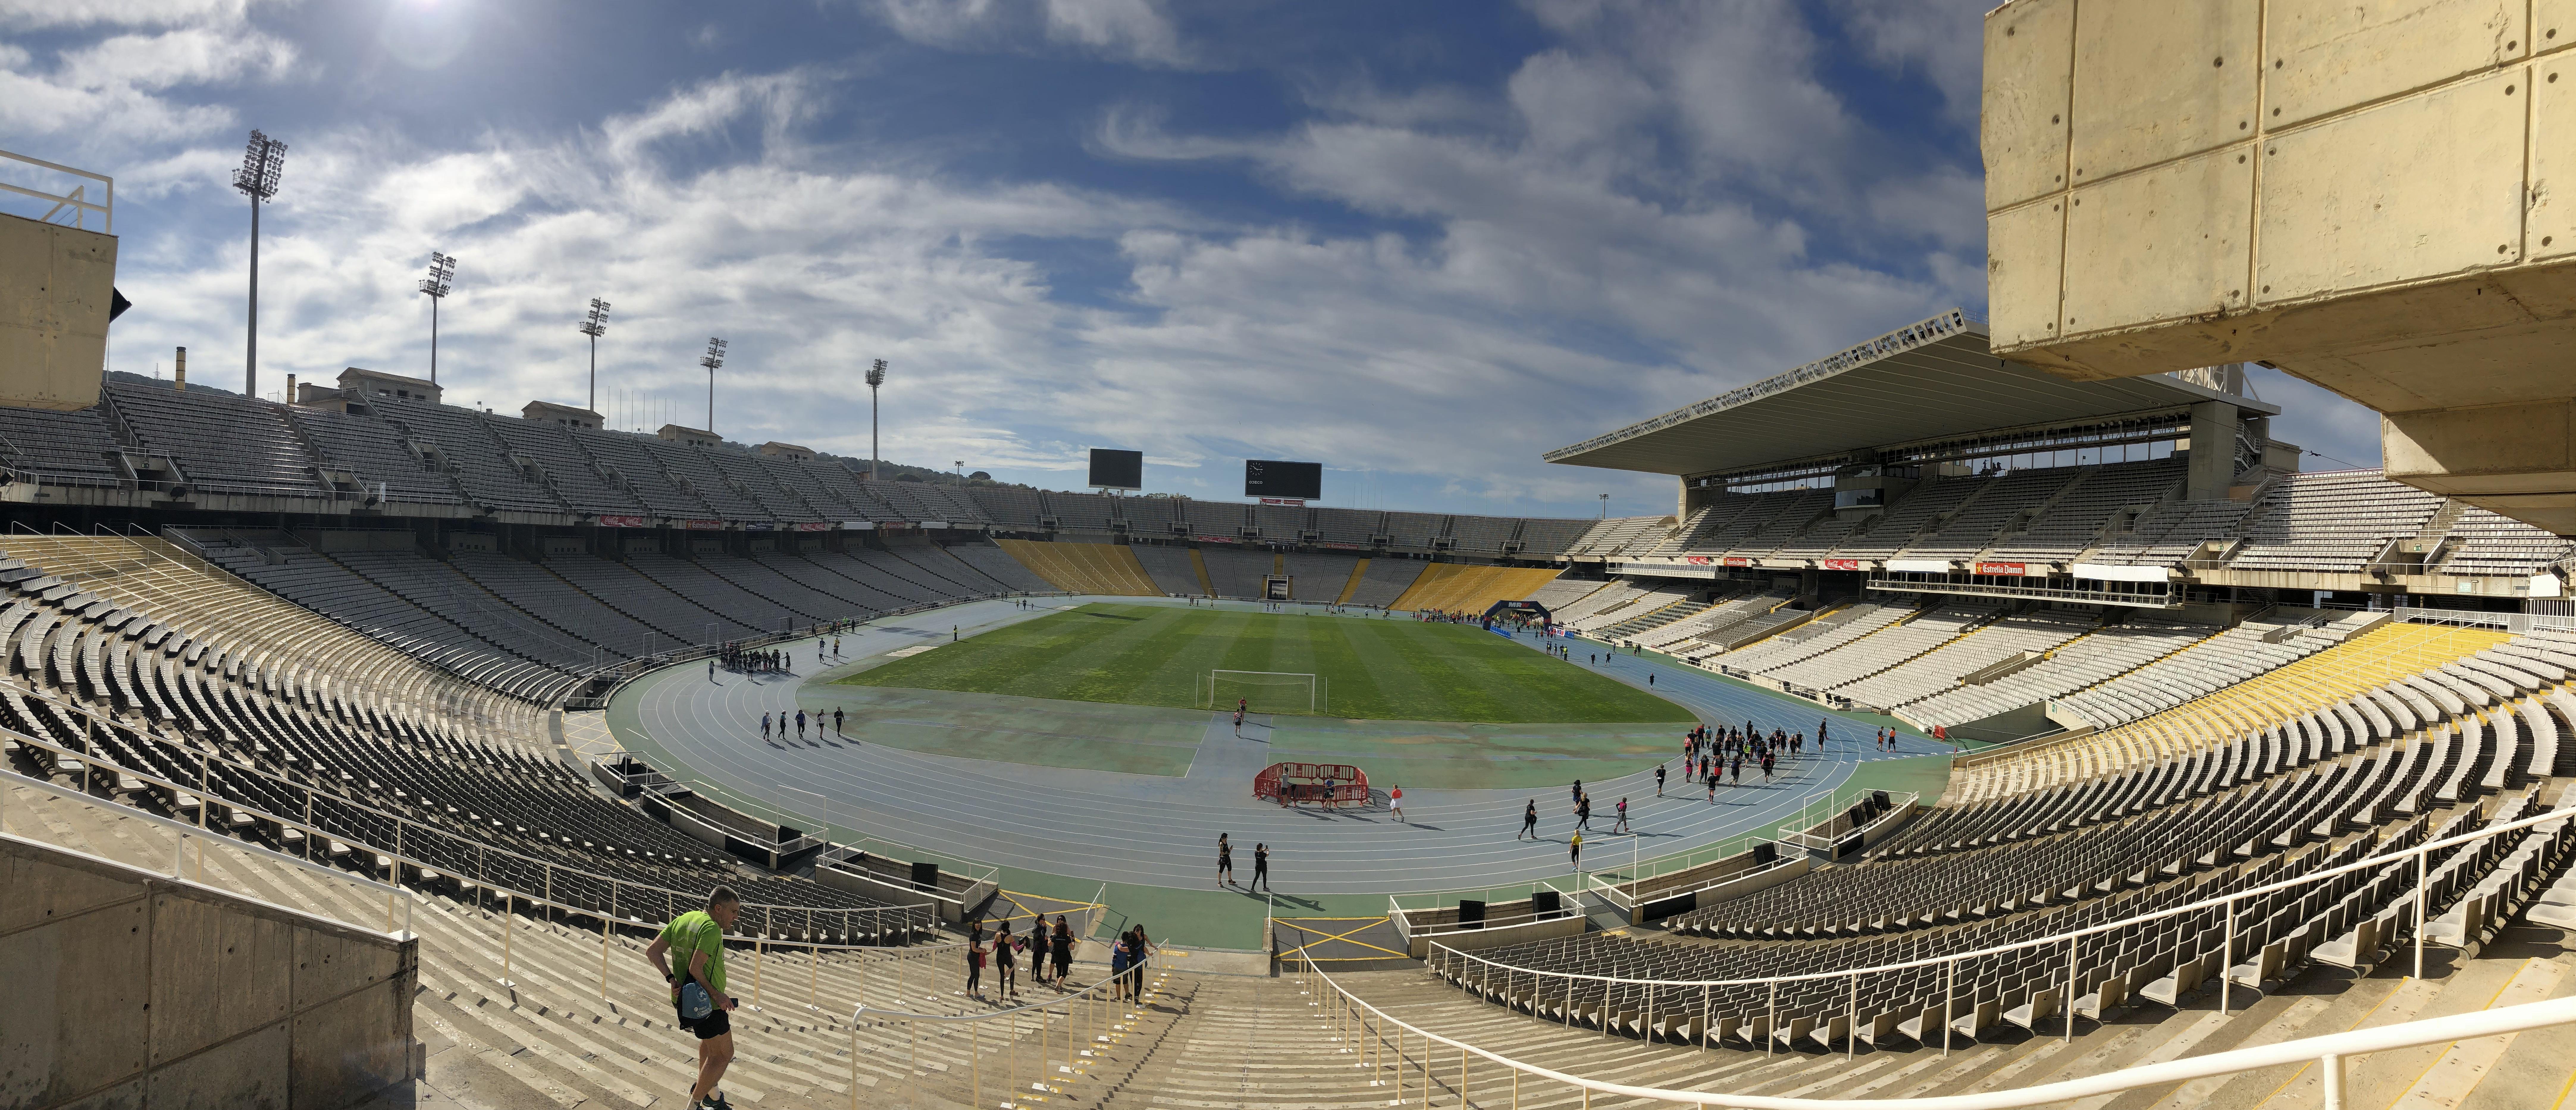 Stade Olympique de Barcelone Lluís Companys